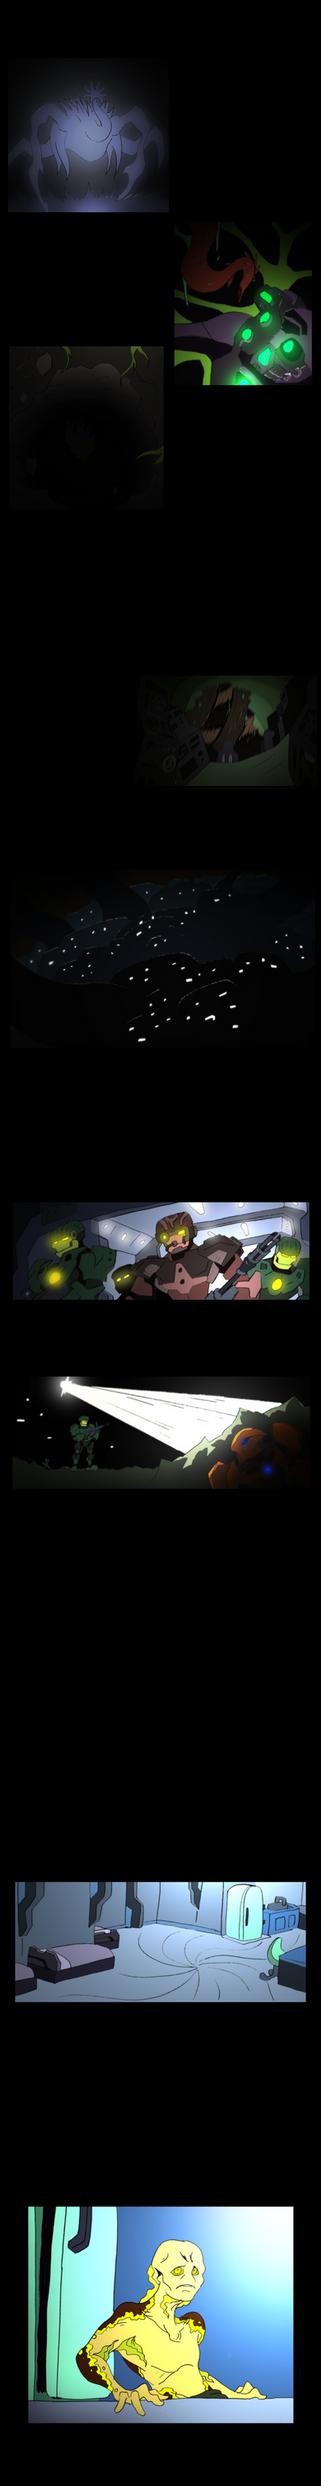 Bionicle- Nova Orbis- Mystery- Chapter 20 by NickinAmerica